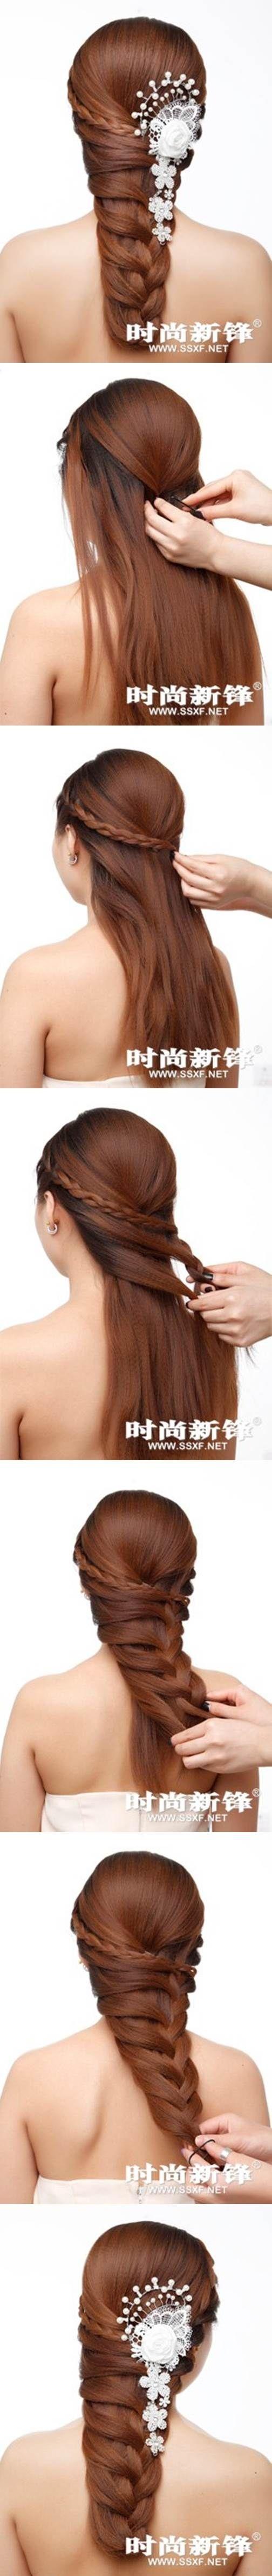 How to make a asymmetrical braid hairstyle hair diy hairstyle diy hair braid hairstyle